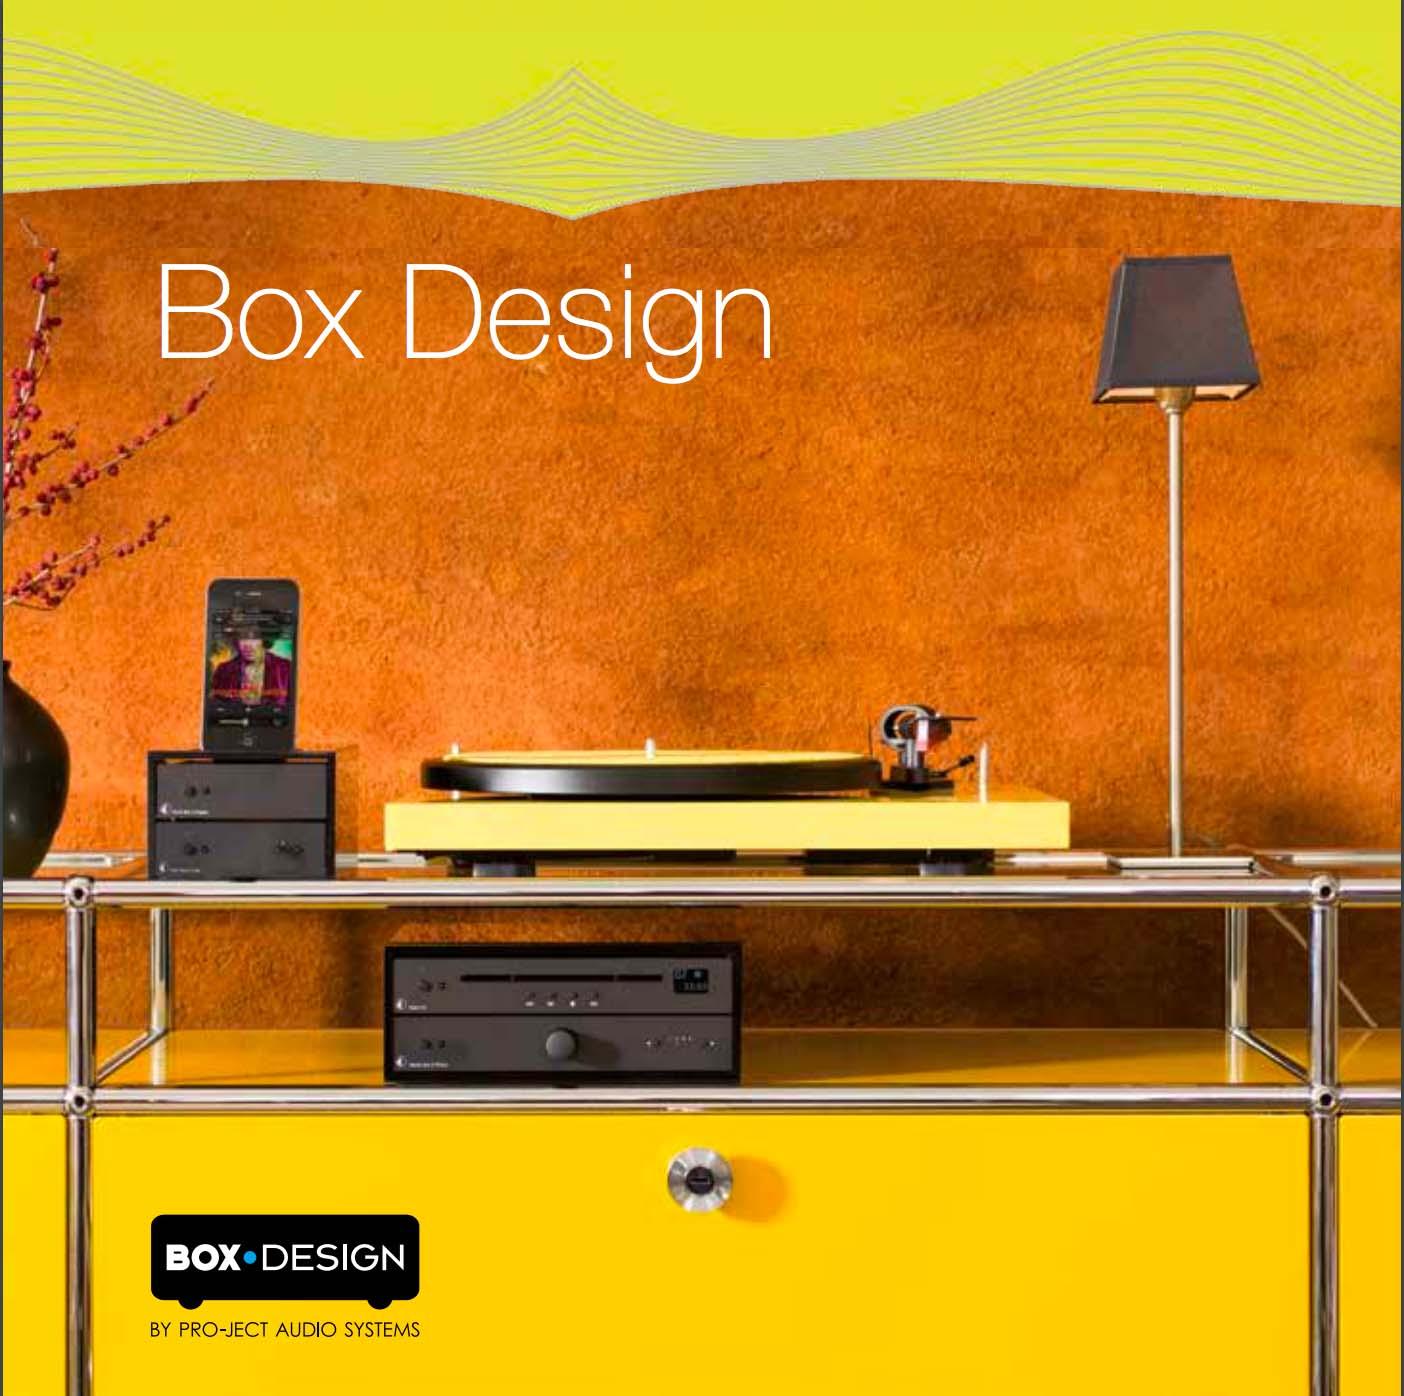 box-design-catalogue.jpg